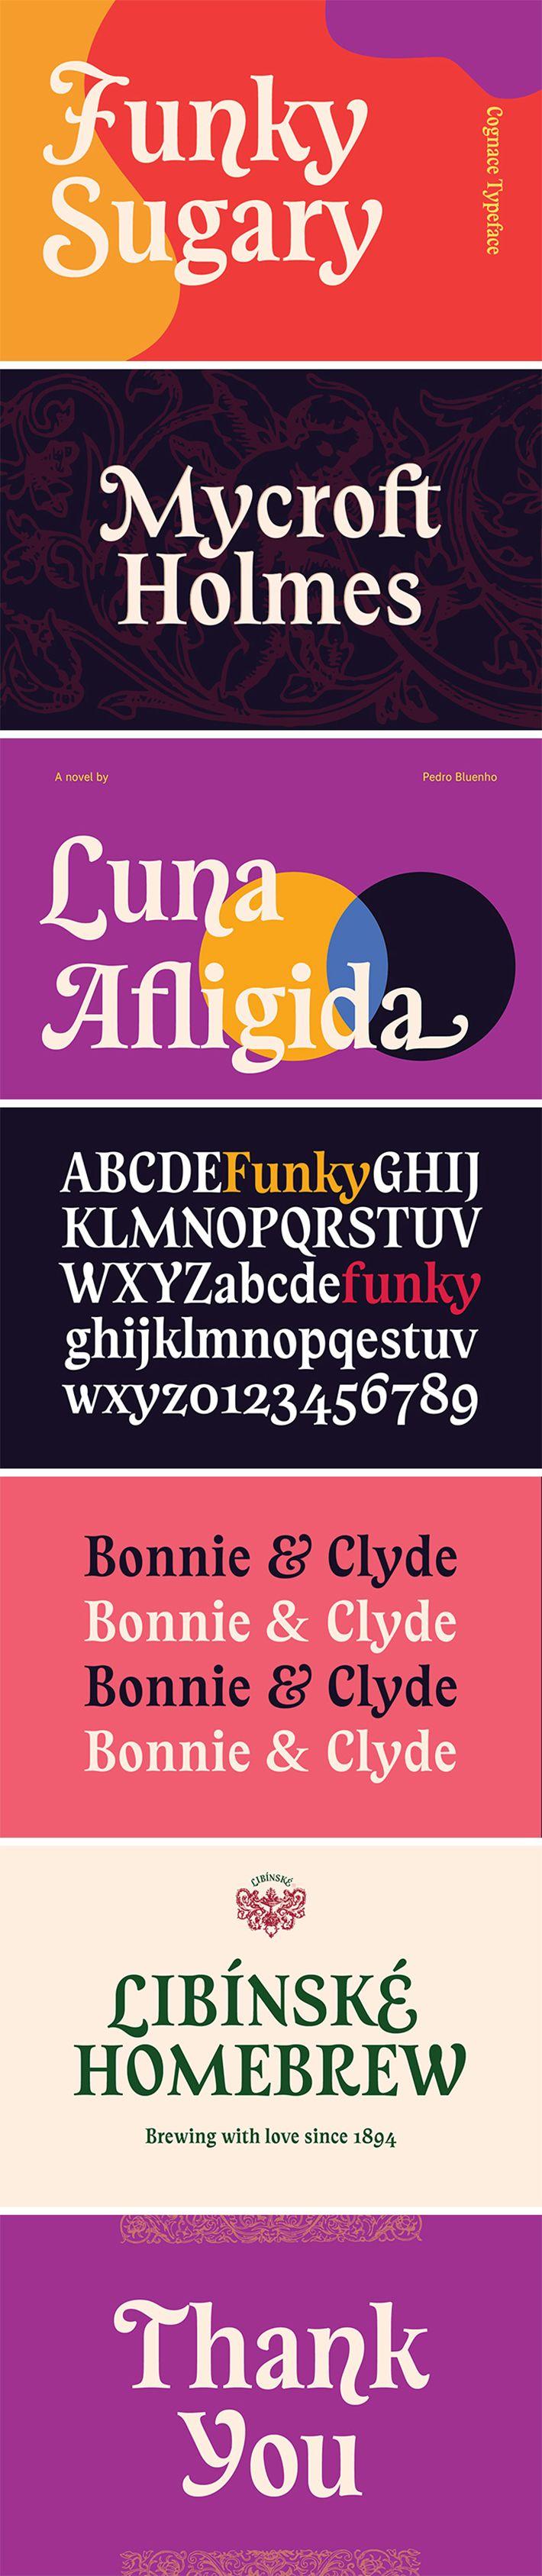 15 Elegant Free Fonts in 2020 Decorative font, Graphic